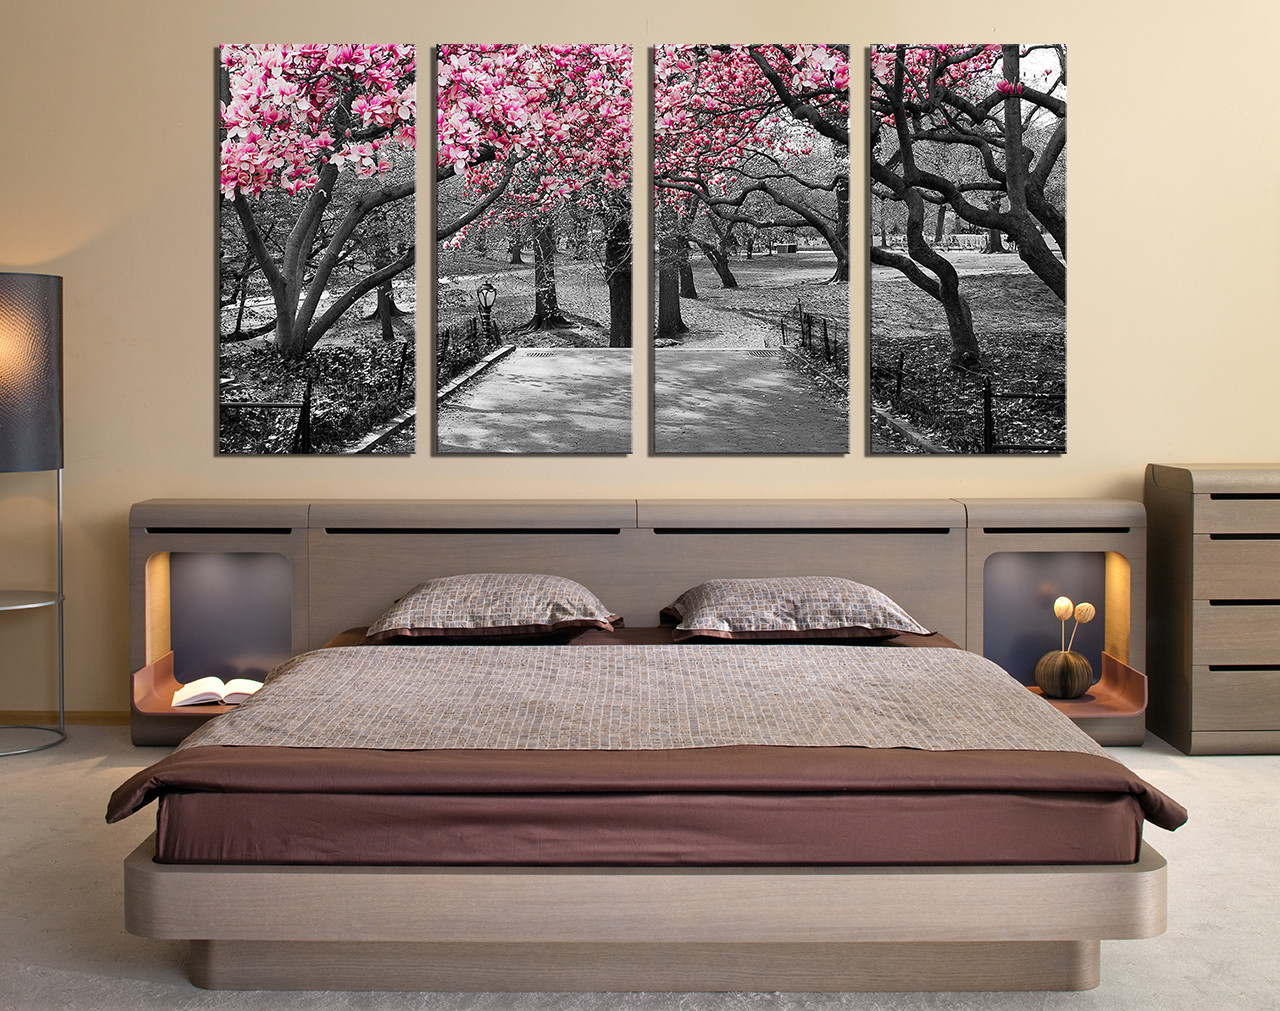 4 Piece Canvas Art Prints, Bedroom Canvas Wall Art, Grey Group Canvas, Tree